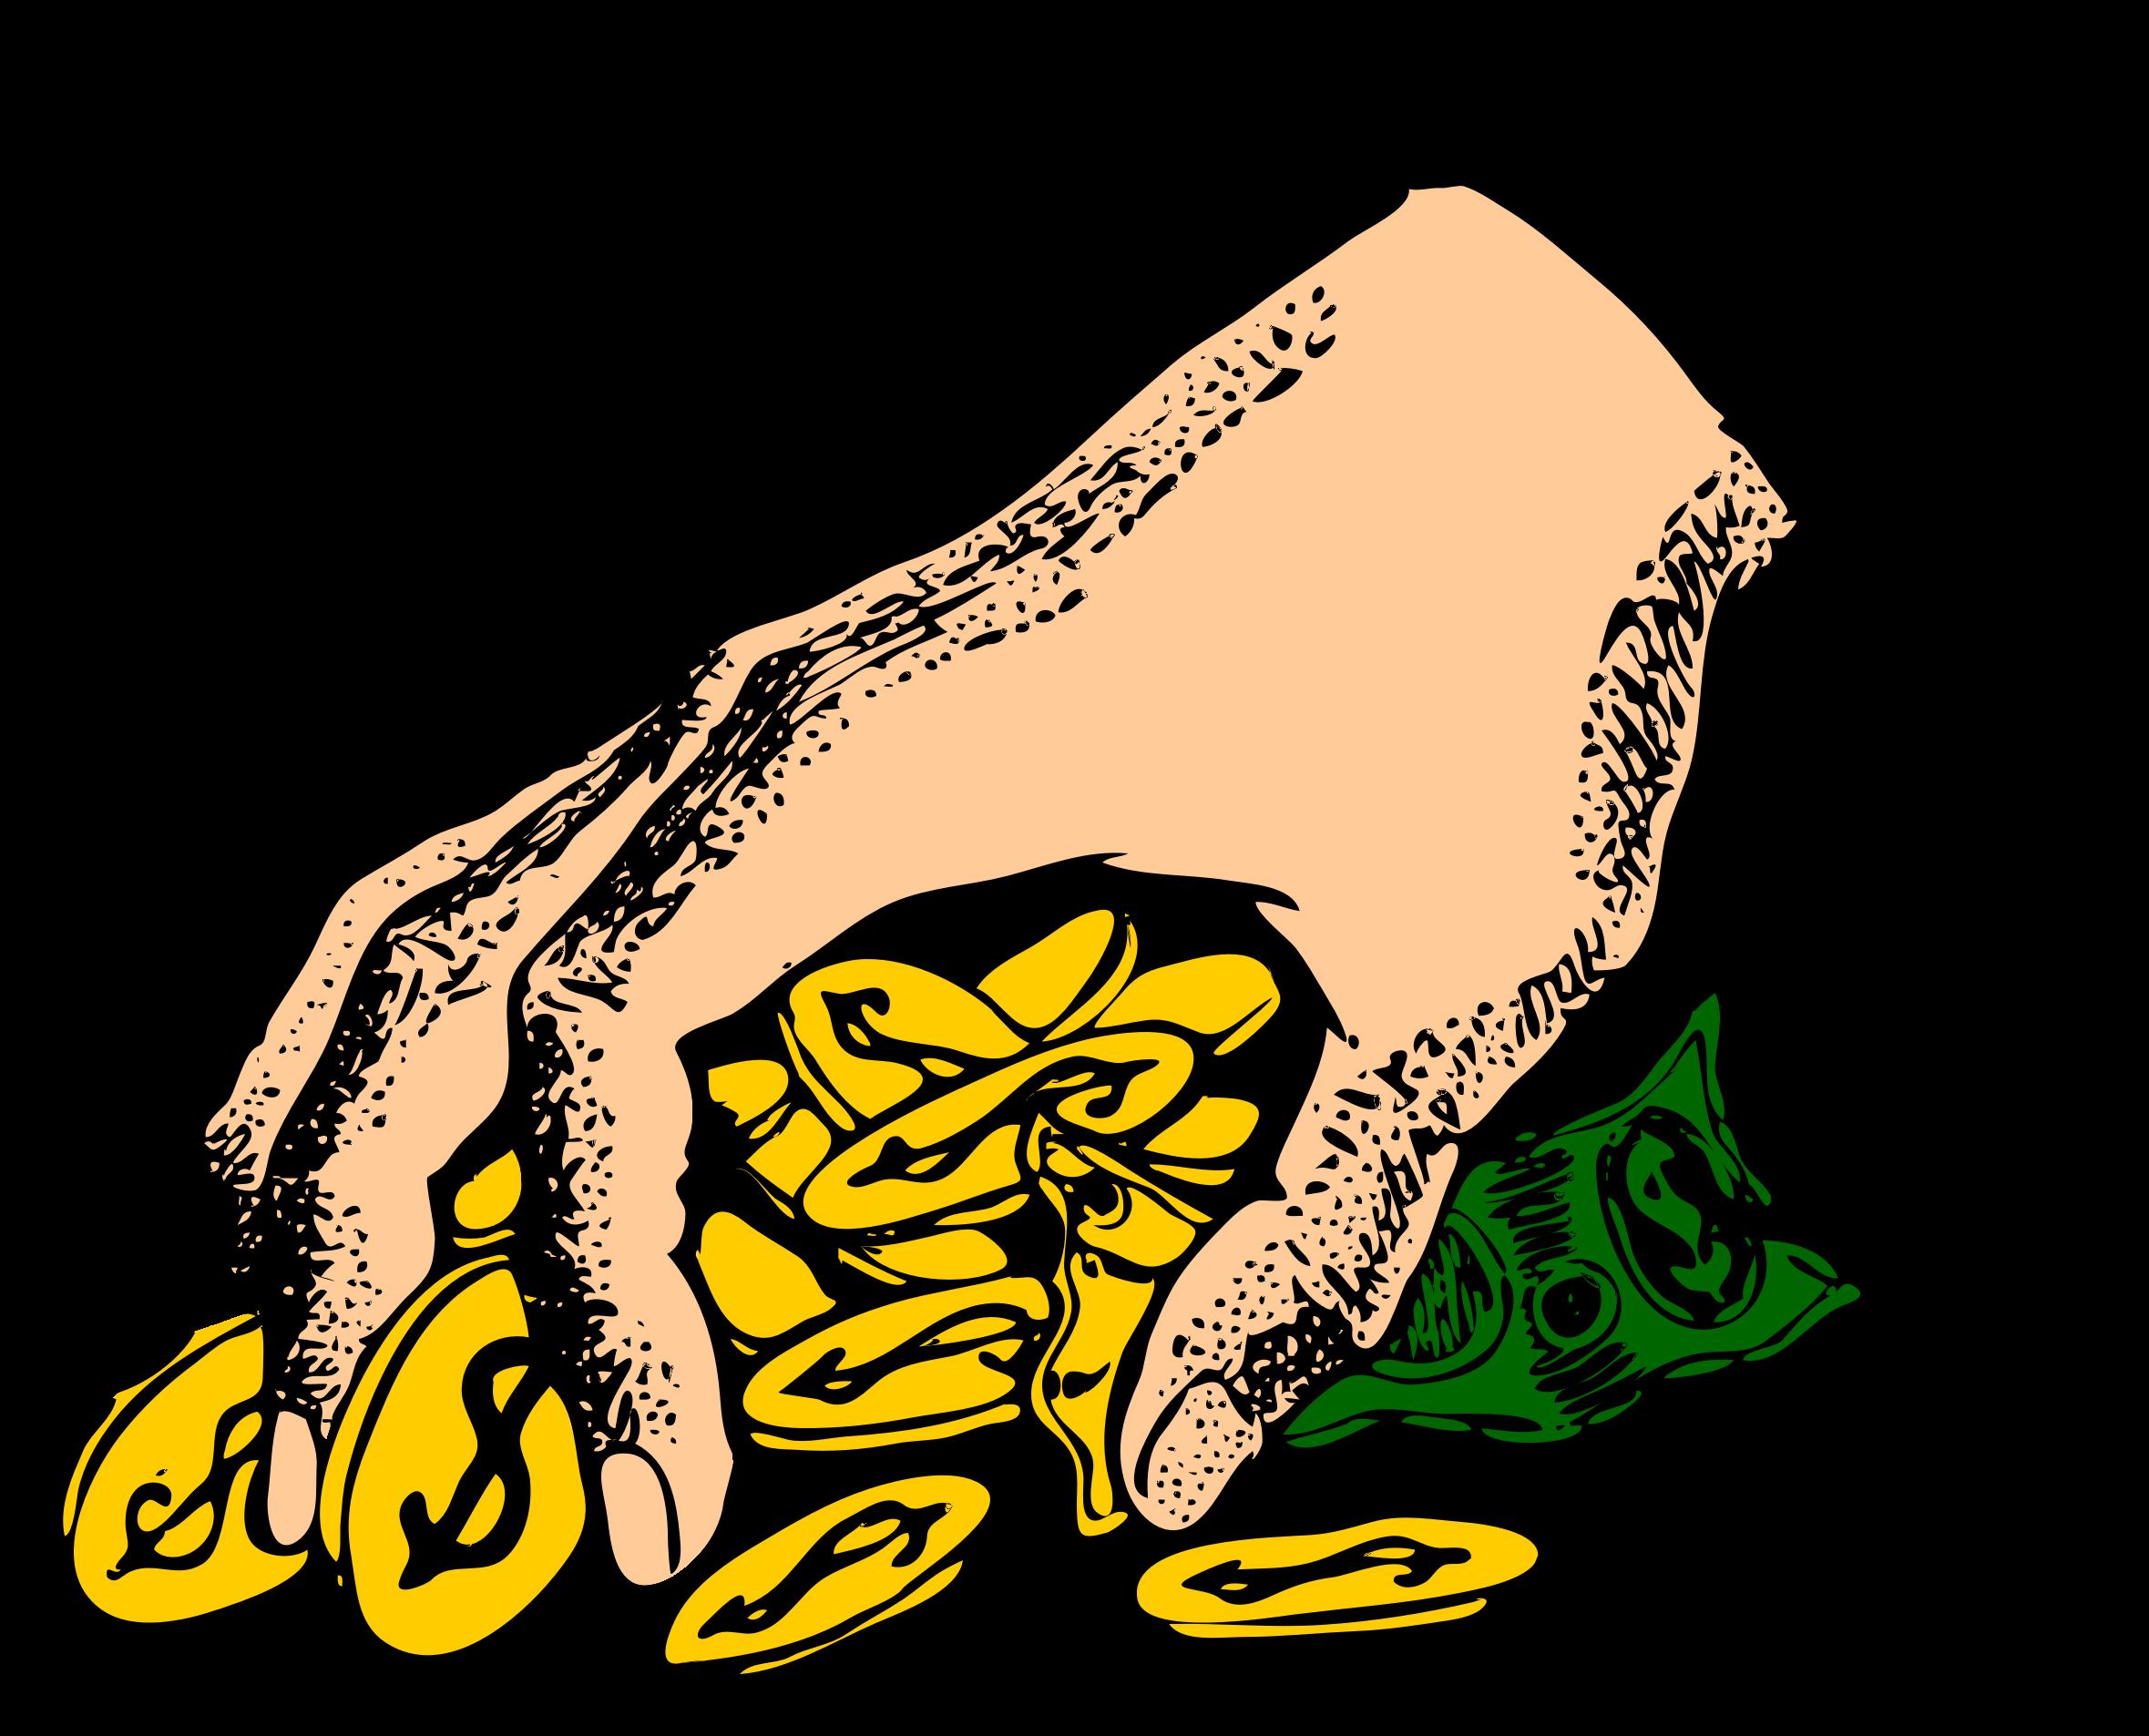 Money check clipart image Money 16 High Resolution Clip Art - http://www.dailystockphoto.net ... image